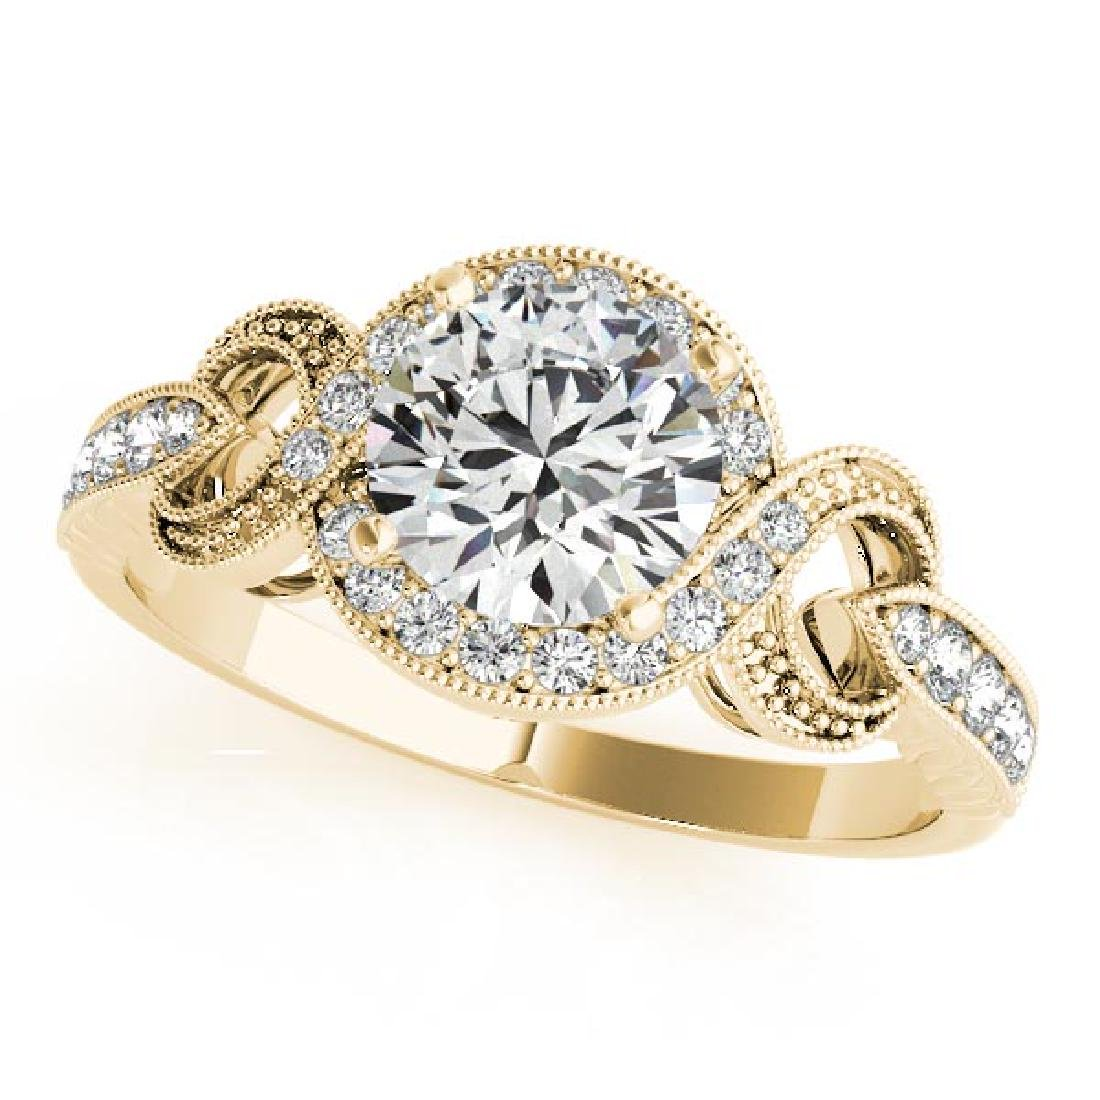 CERTIFIED 18K YELLOW GOLD 0.76 CT G-H/VS-SI1 DIAMOND HA